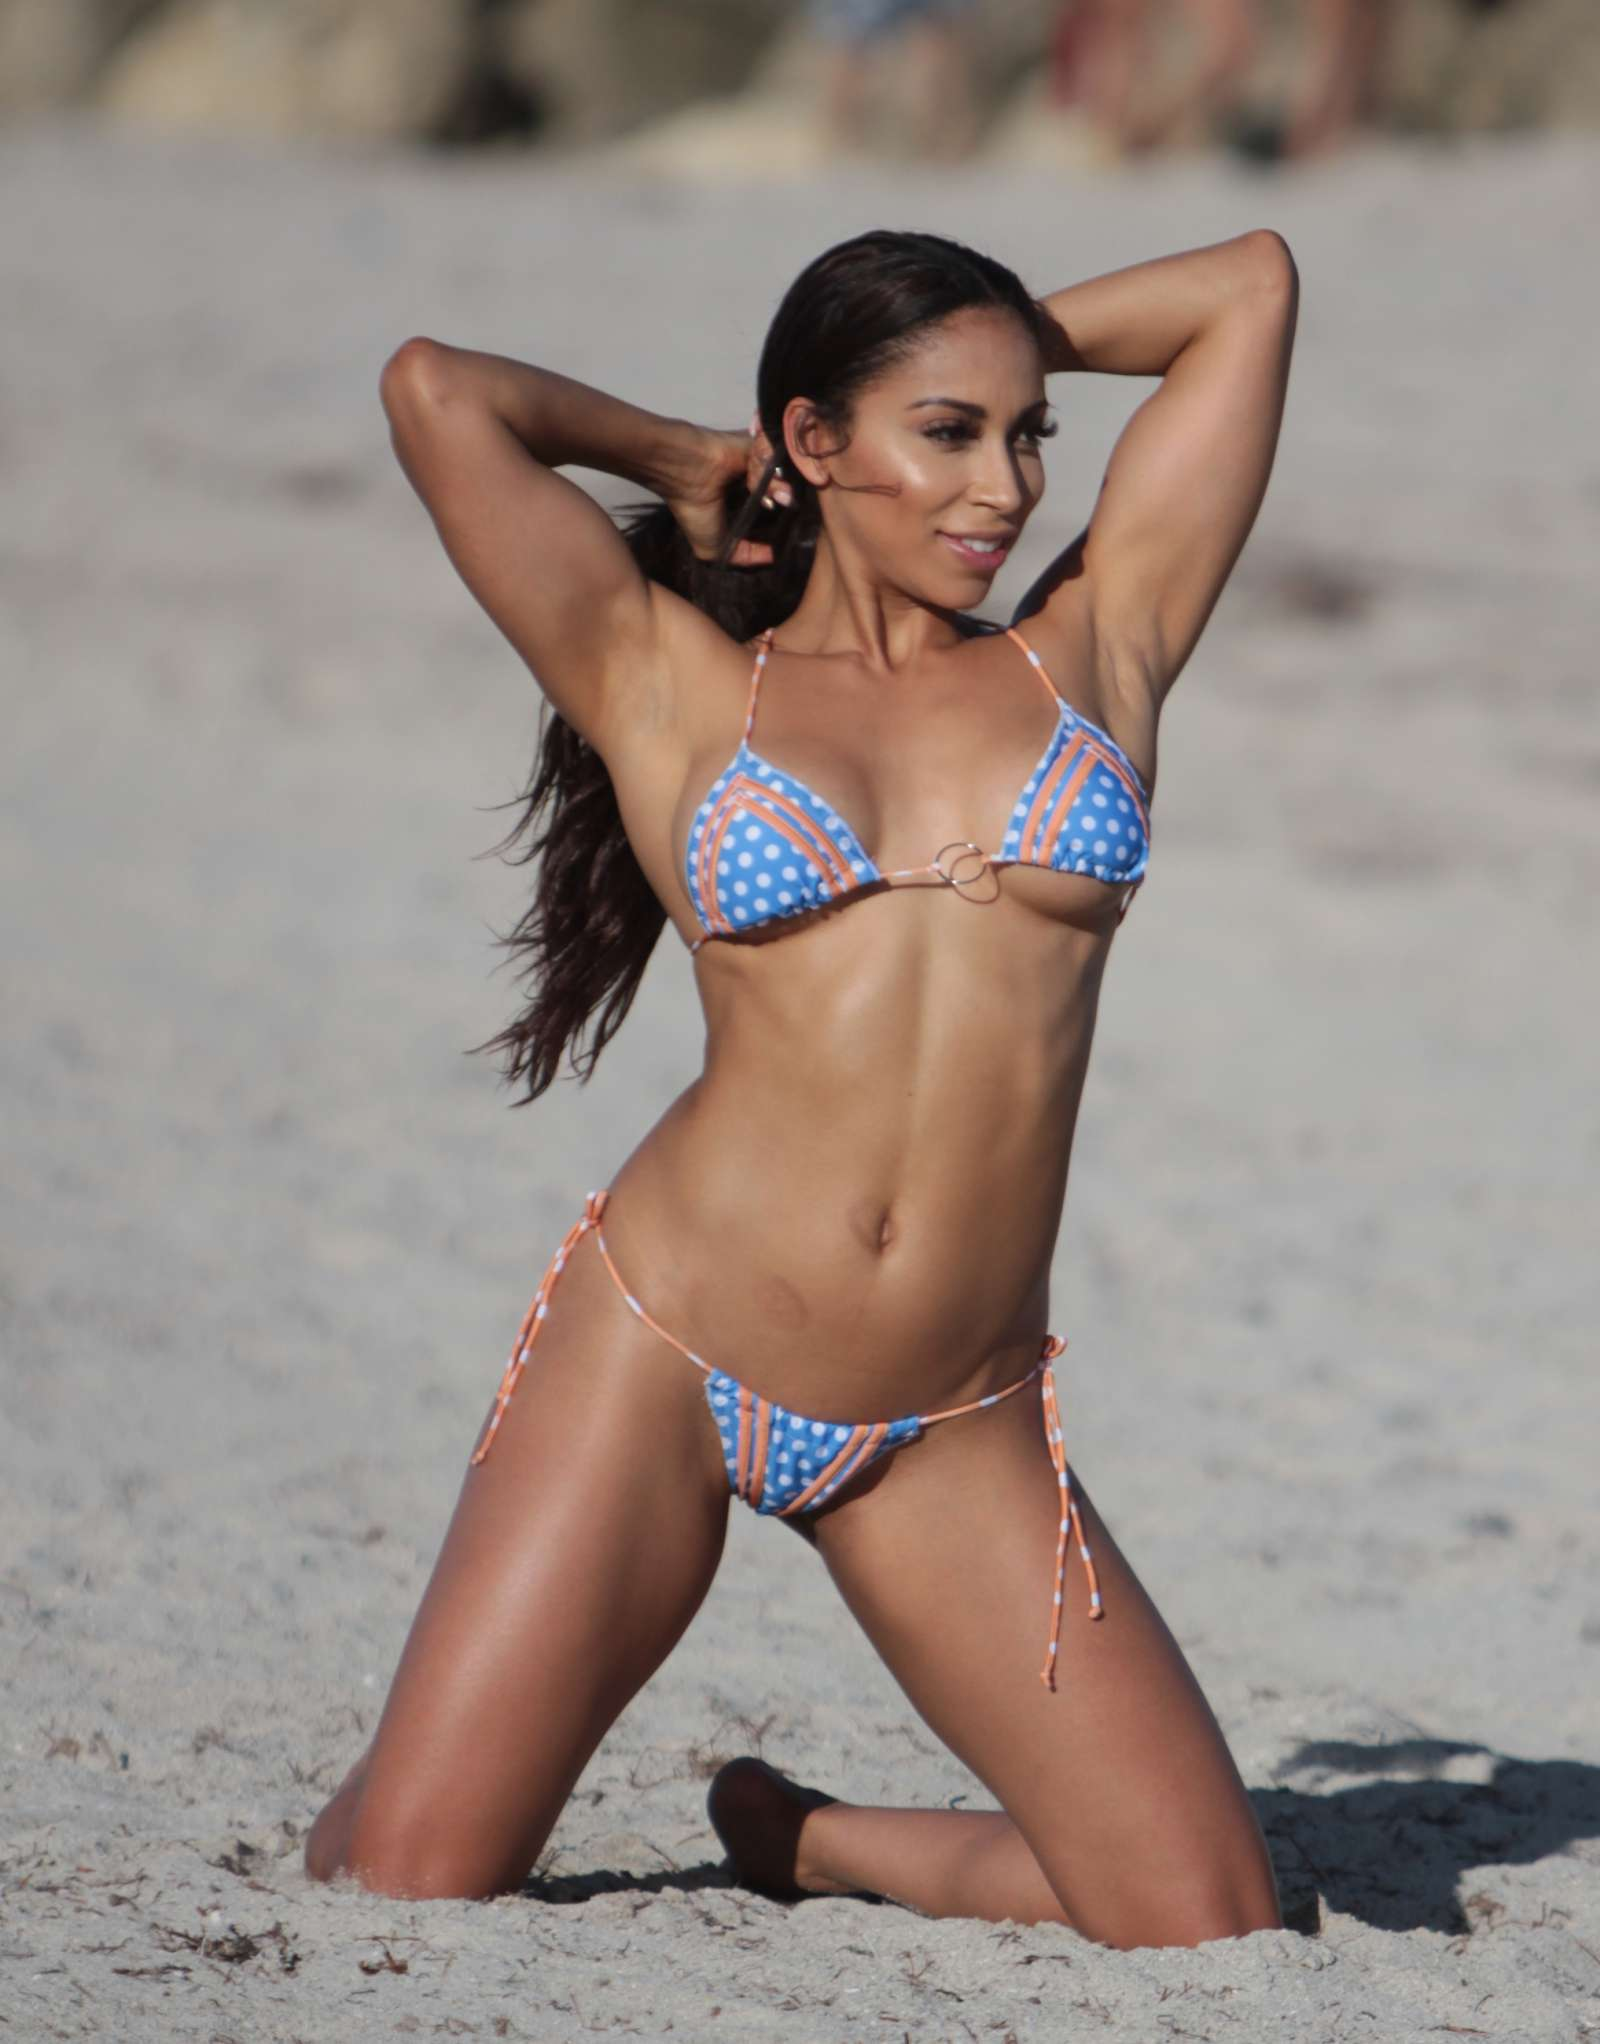 Pictures Sophia Leger Valere naked (61 photos), Pussy, Paparazzi, Feet, in bikini 2015